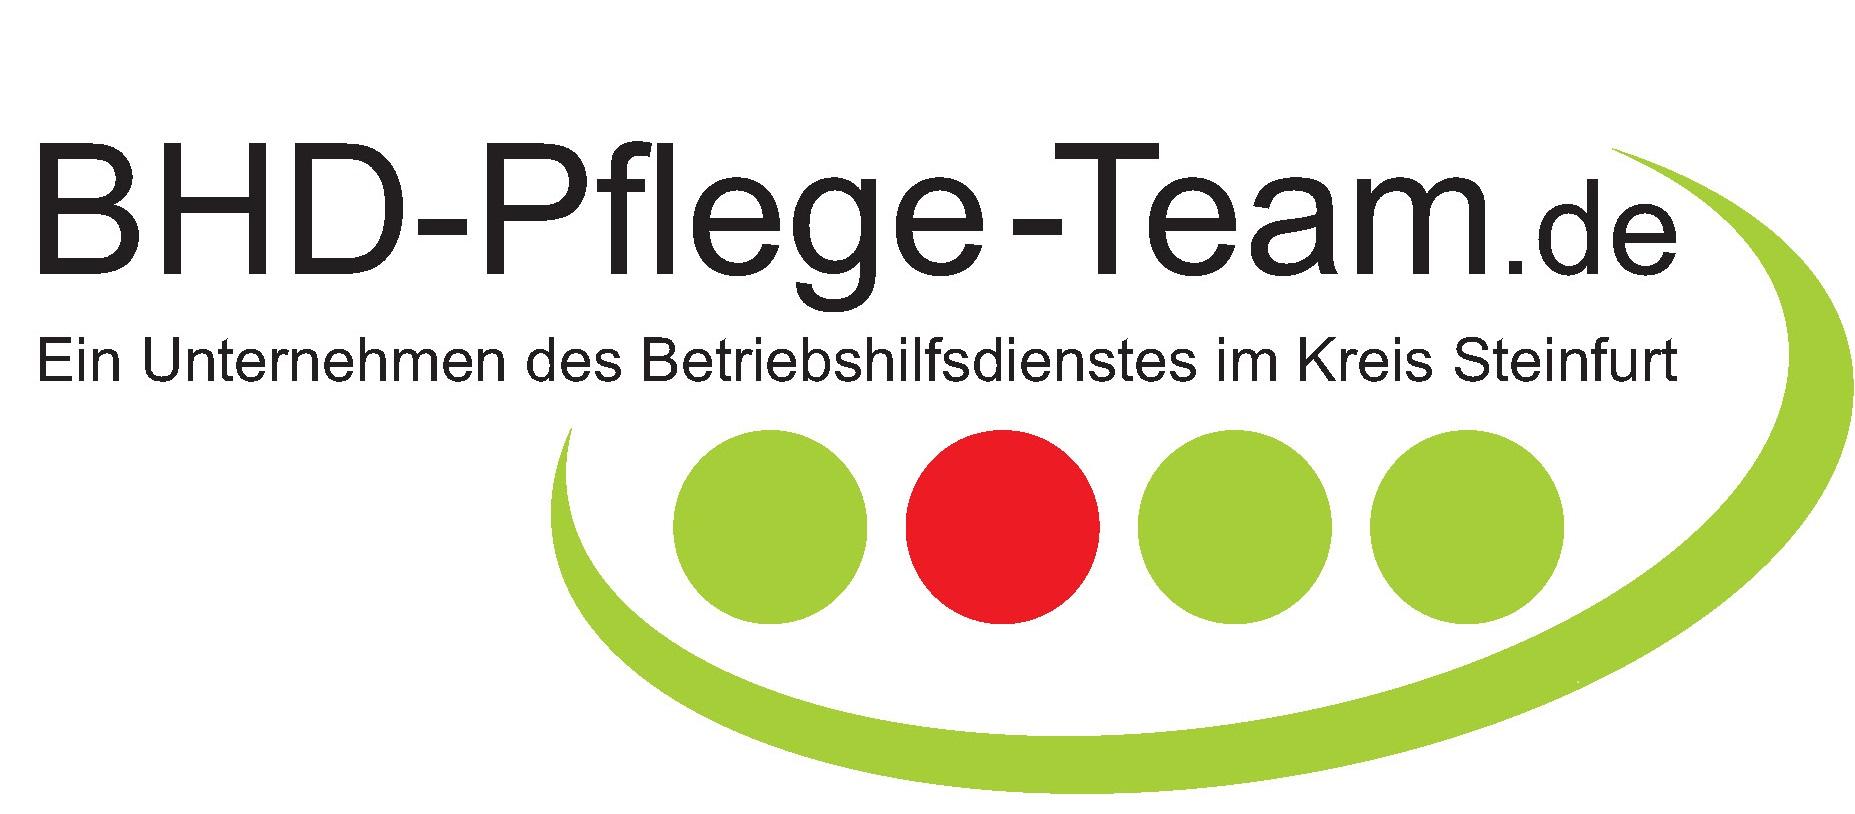 BHD-Pflegedienst-Logo